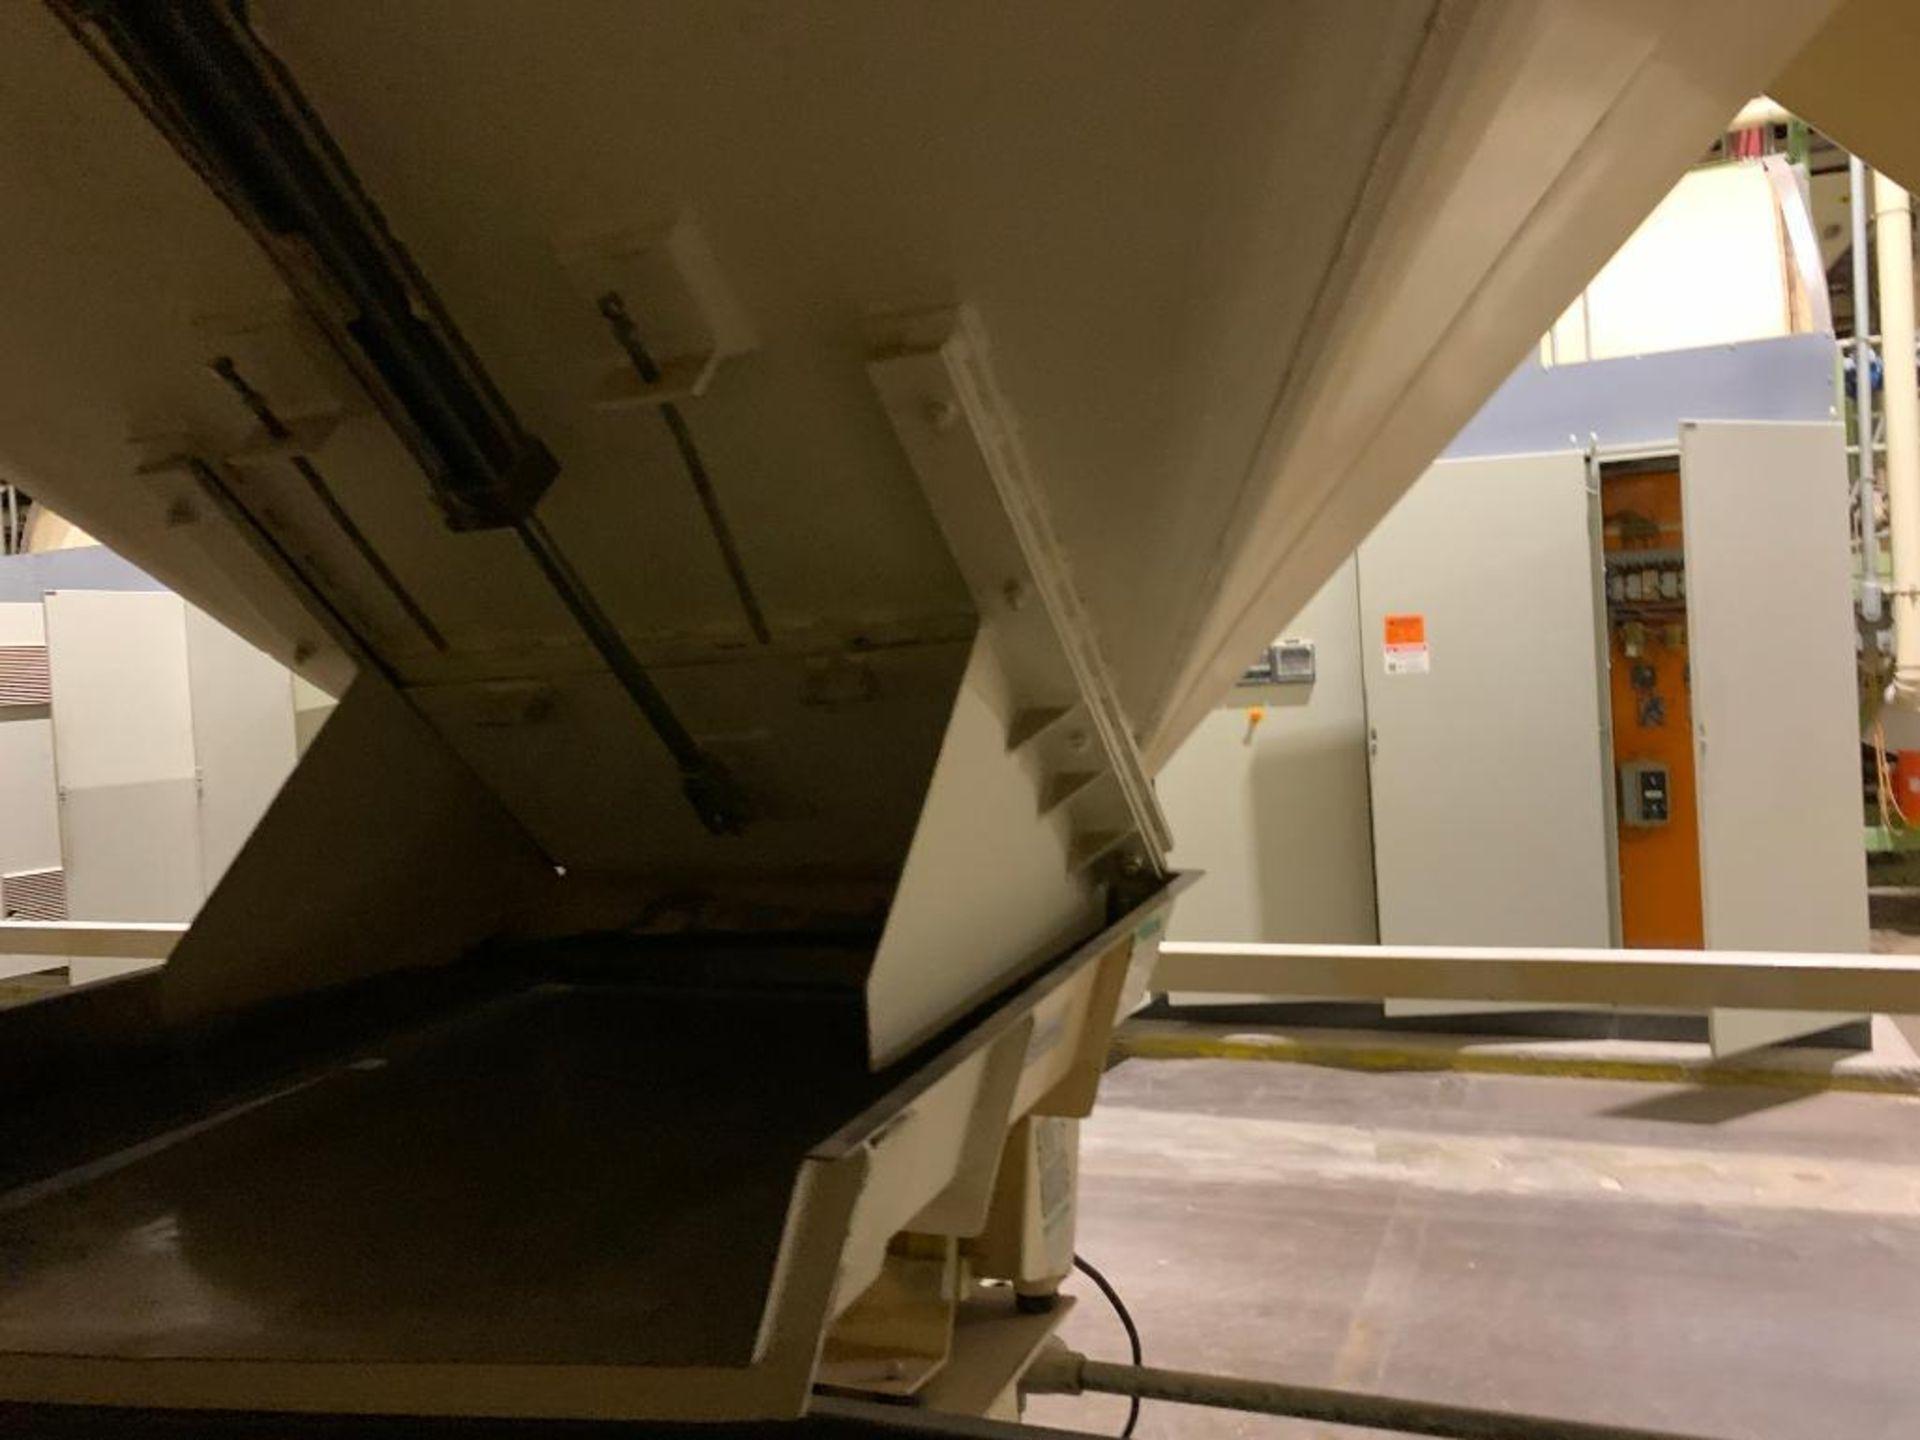 Aseeco mild steel cone bottom bulk storage bin - Image 19 of 27